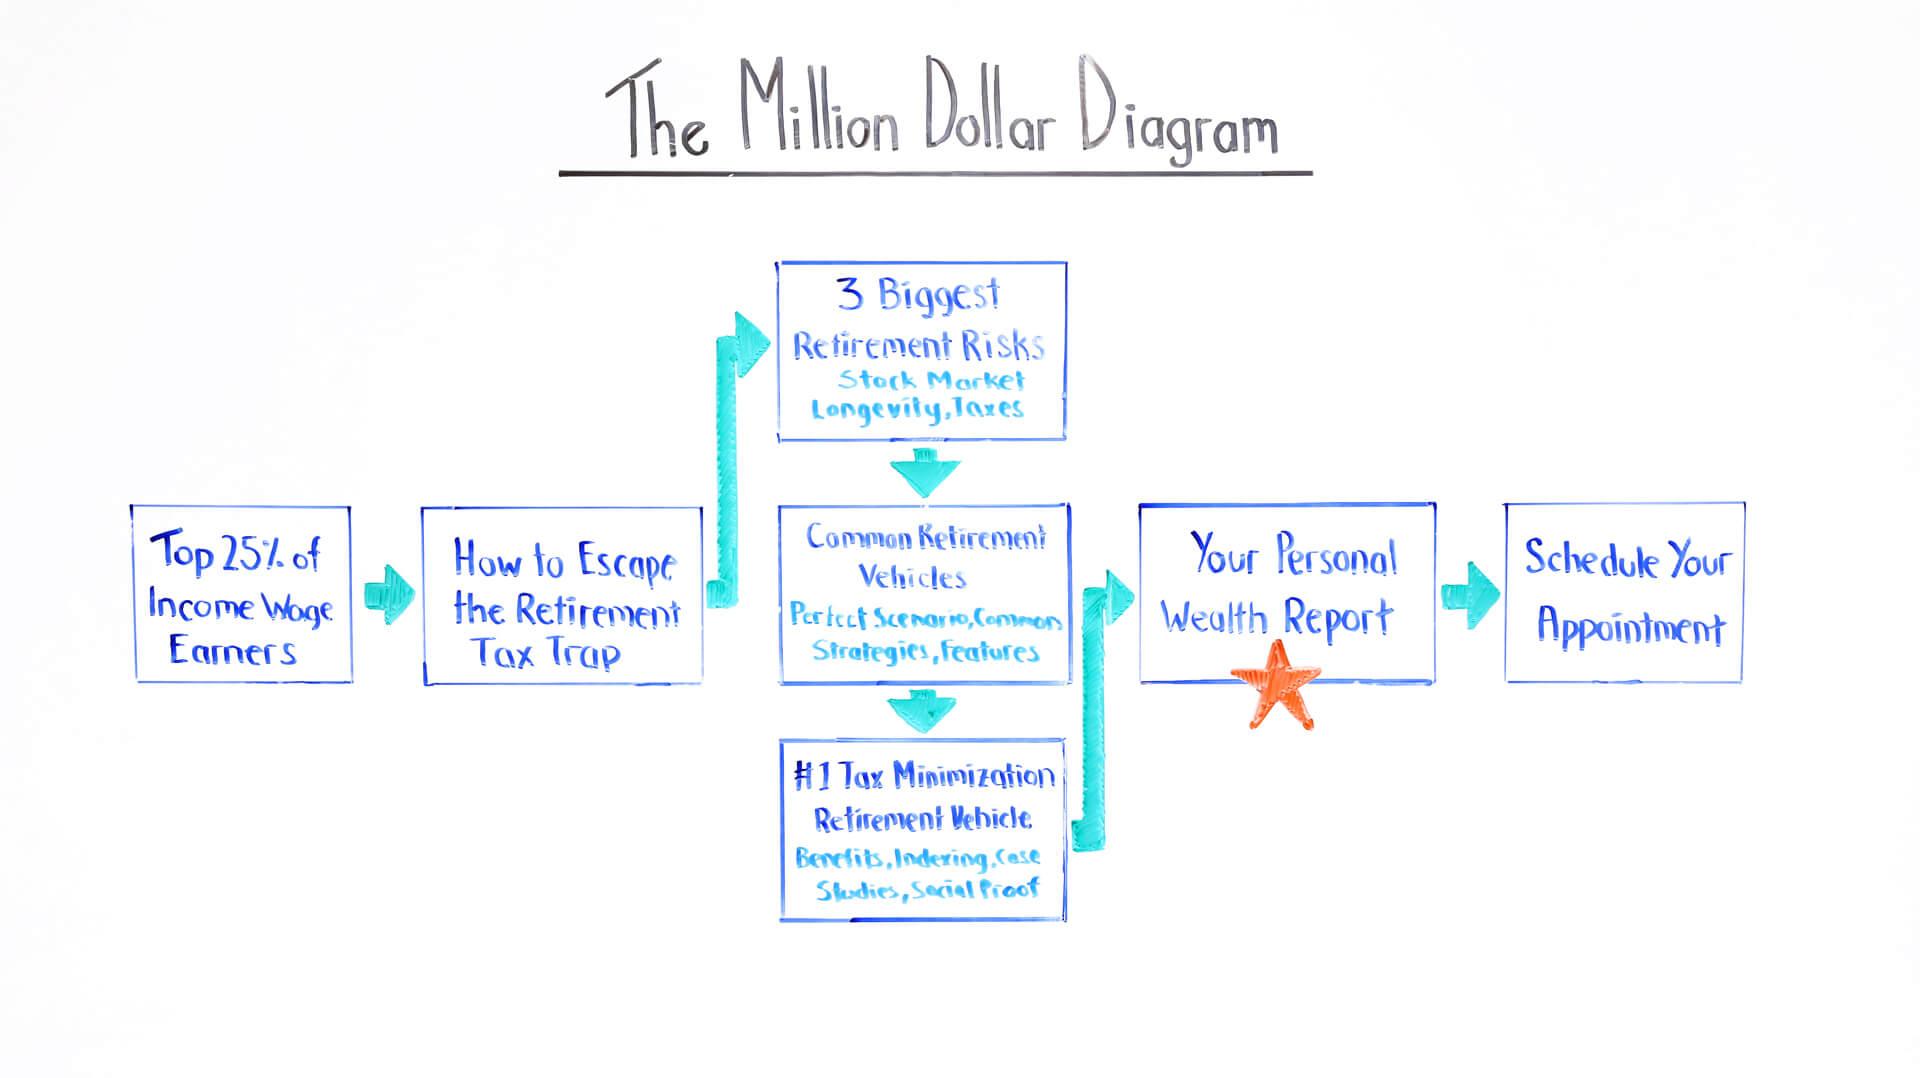 the million dollar diagram